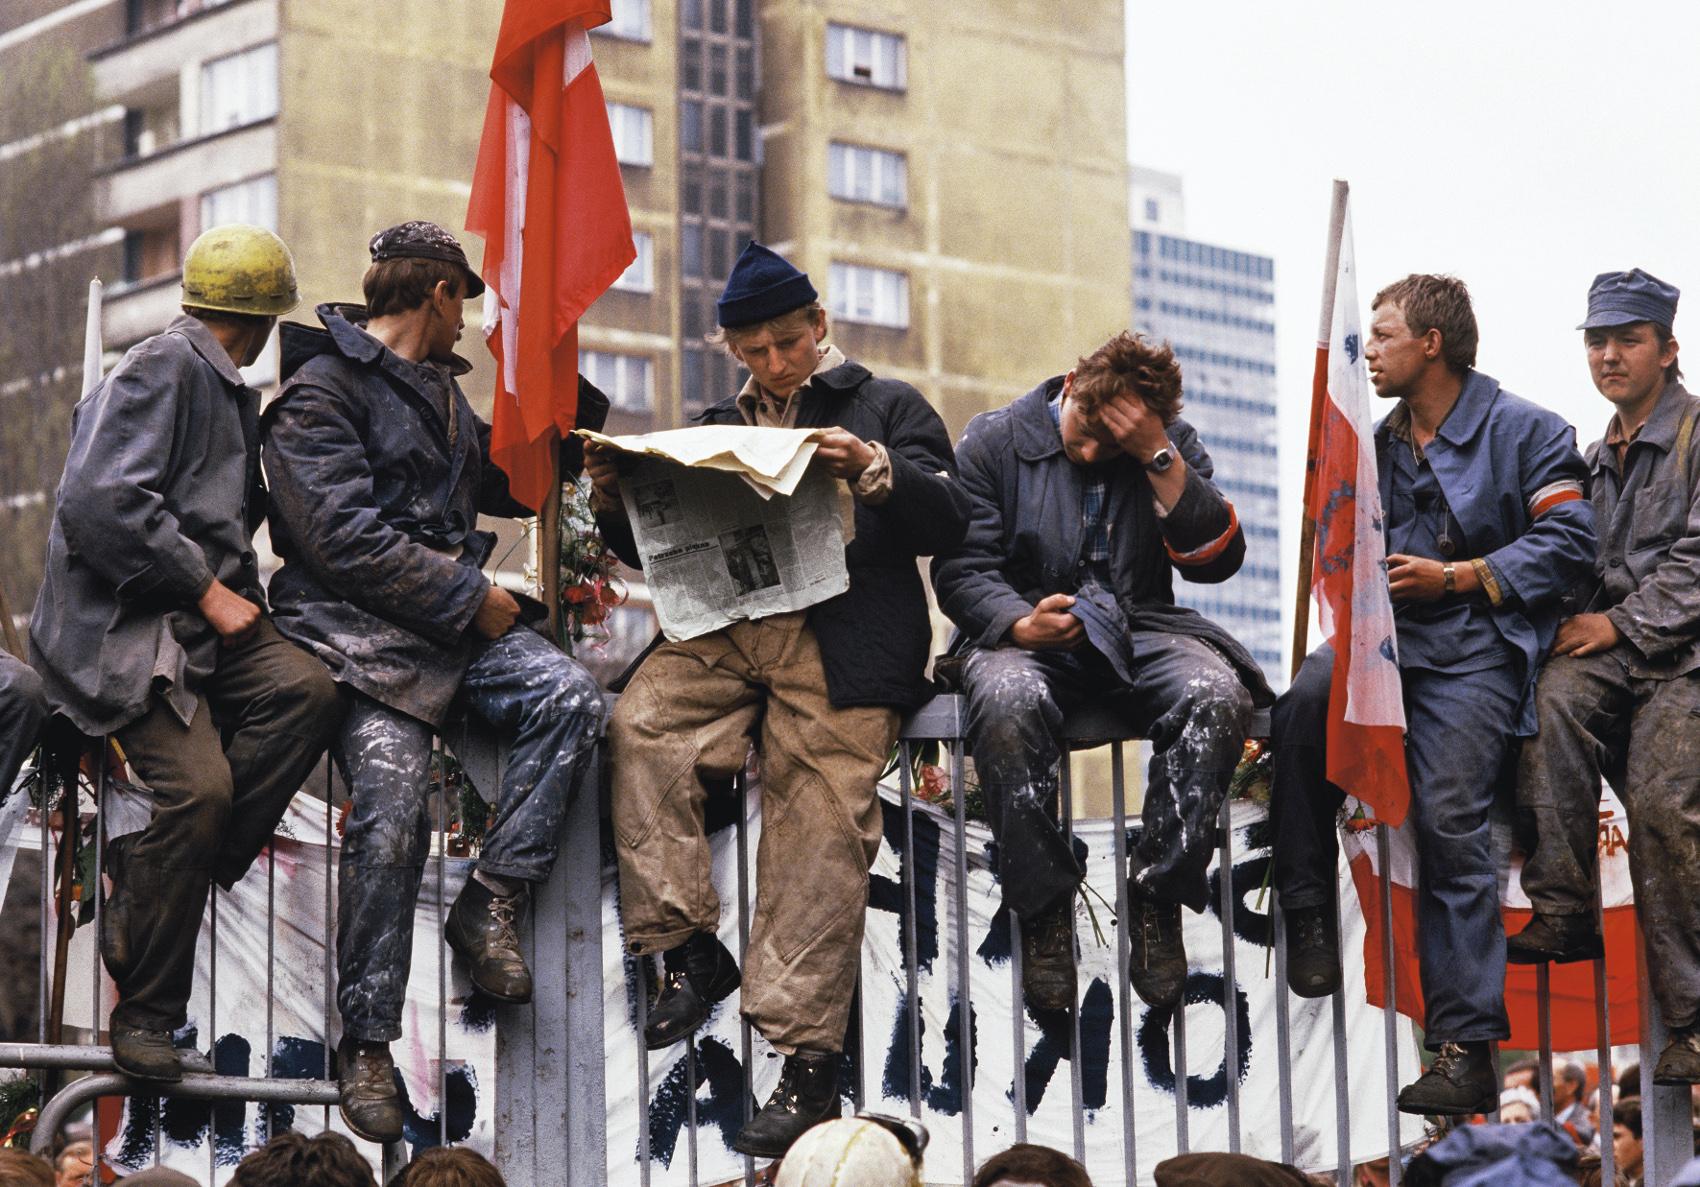 Strike at the Lenin shipyard, 1988, Gdańsk, photo: Chris Niedenthal, promo material